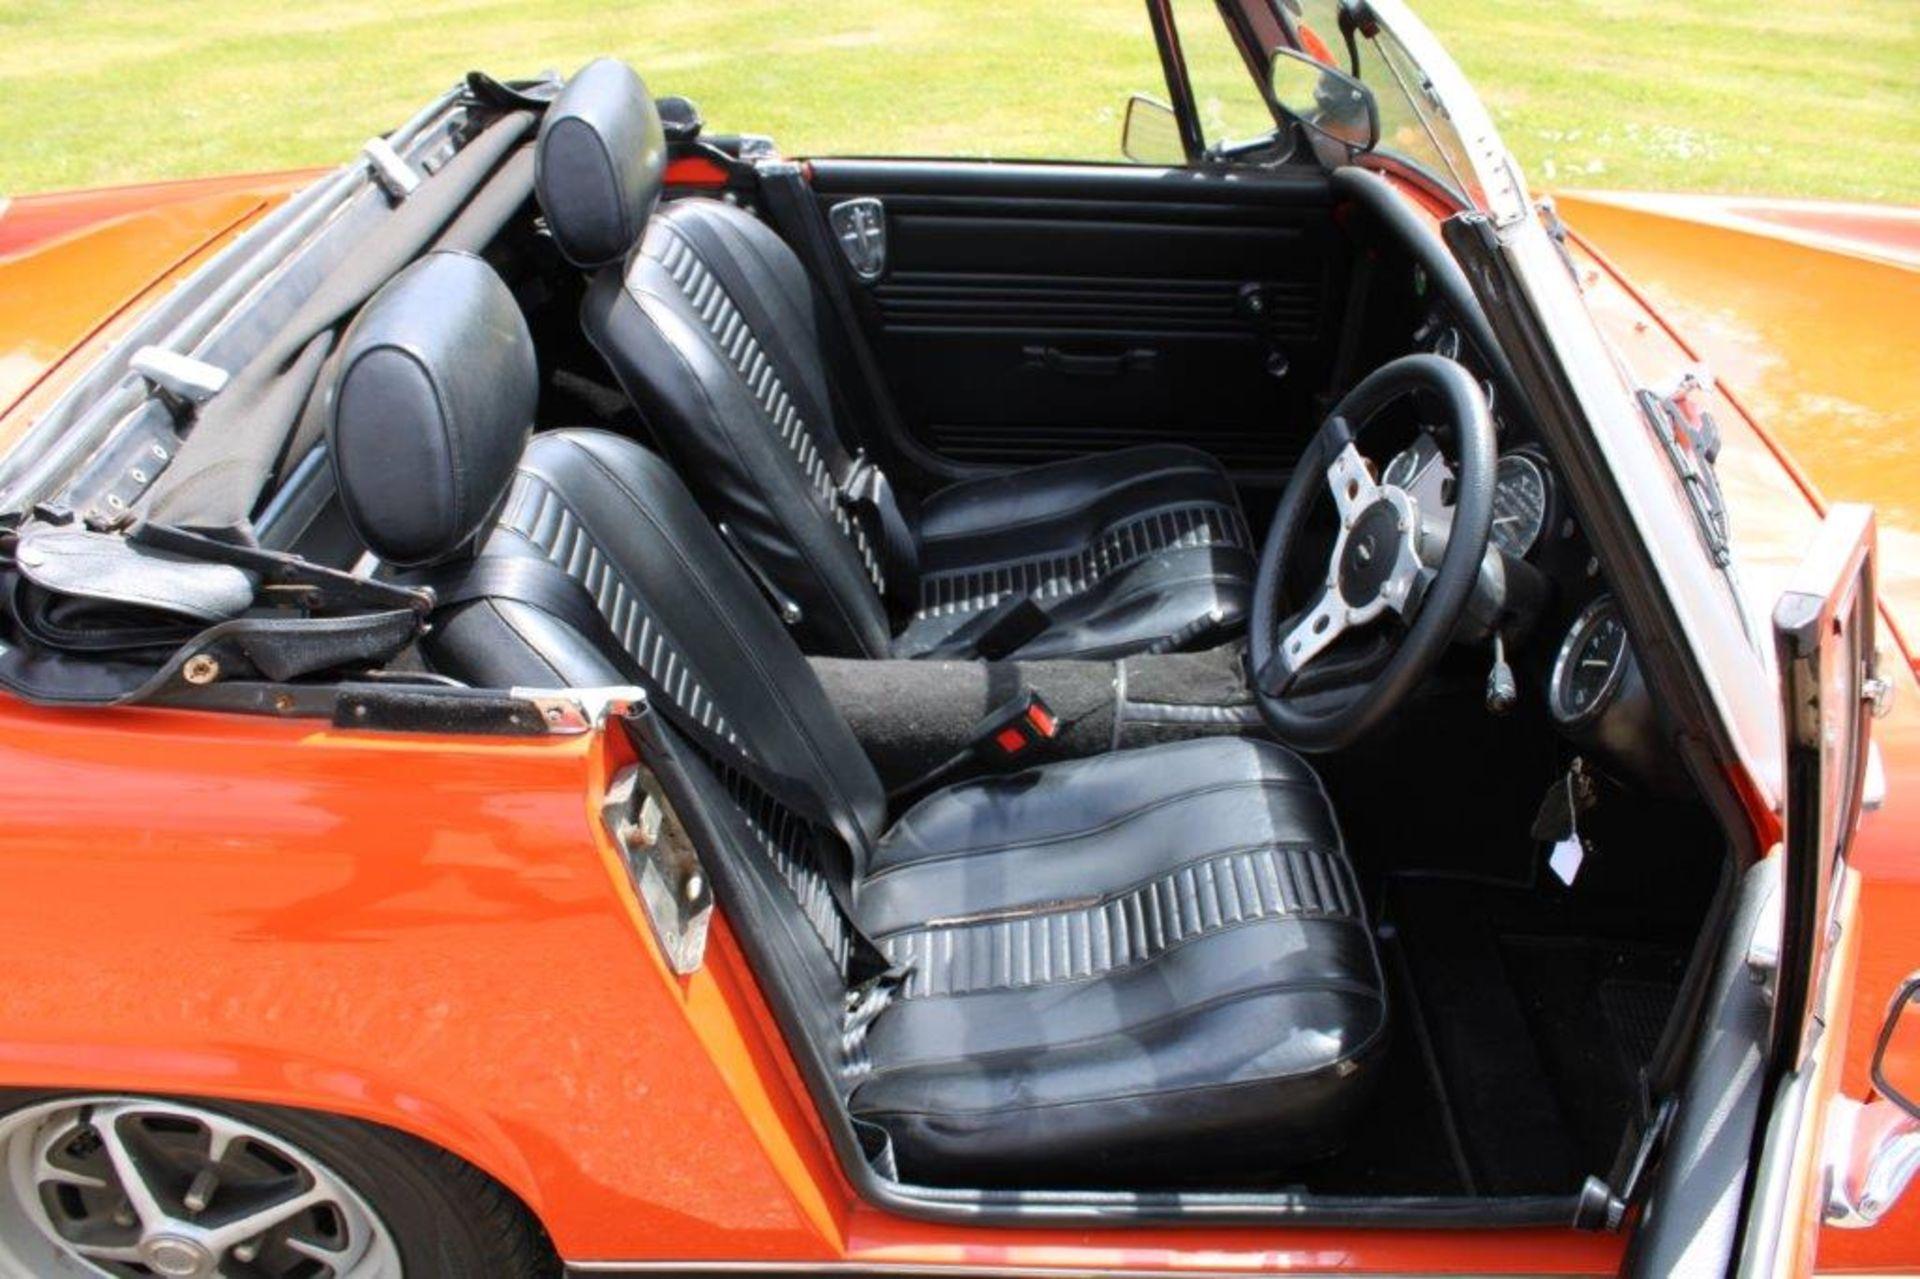 1979 MG Midget 1500 - Image 17 of 37